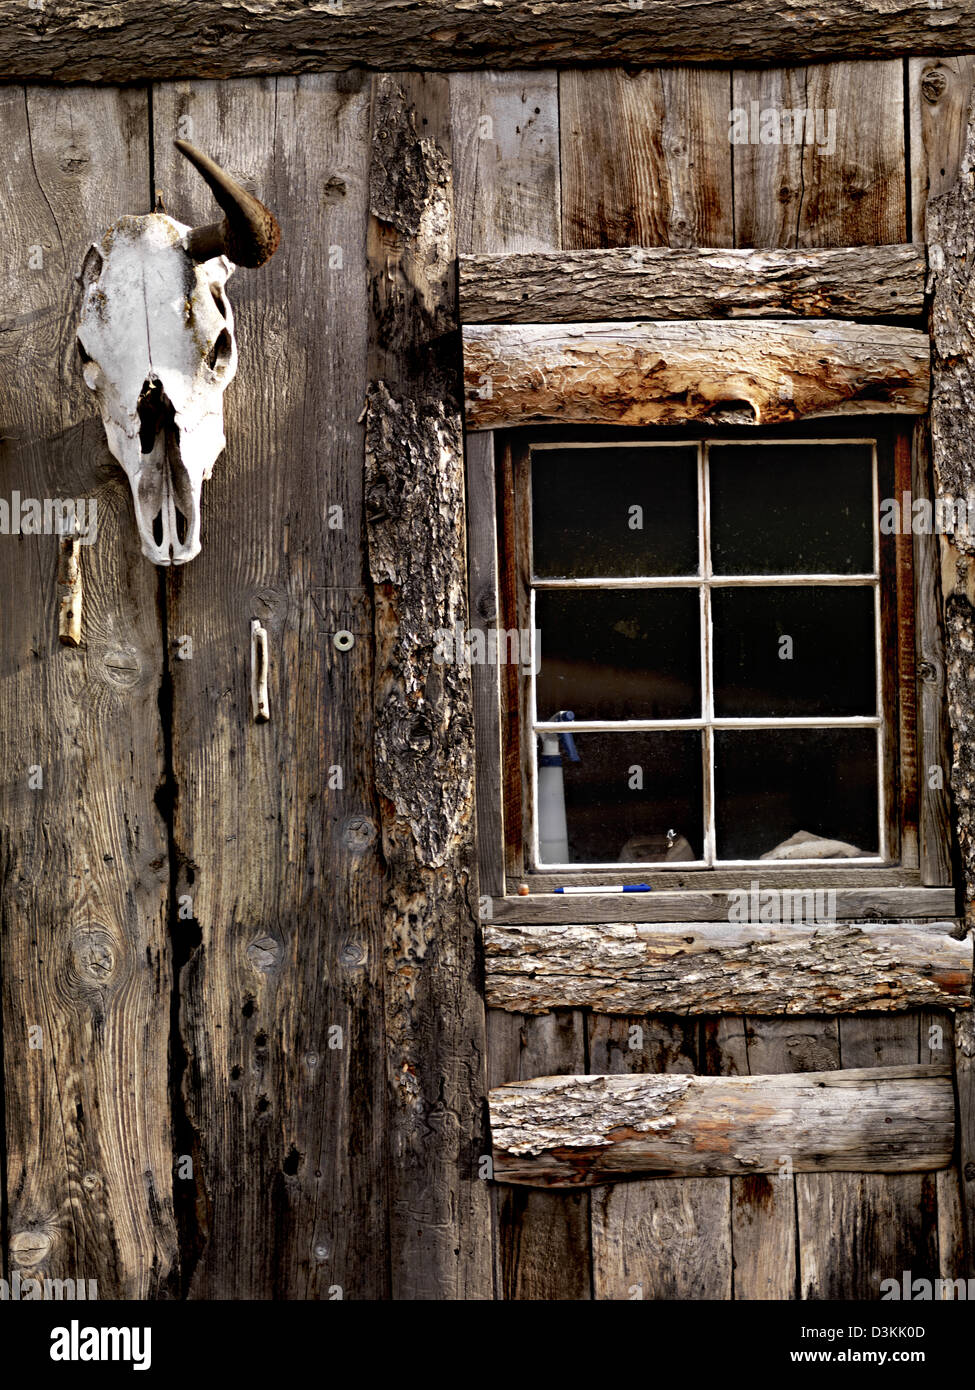 Window with school, log cabin, Montana, USA - Stock Image